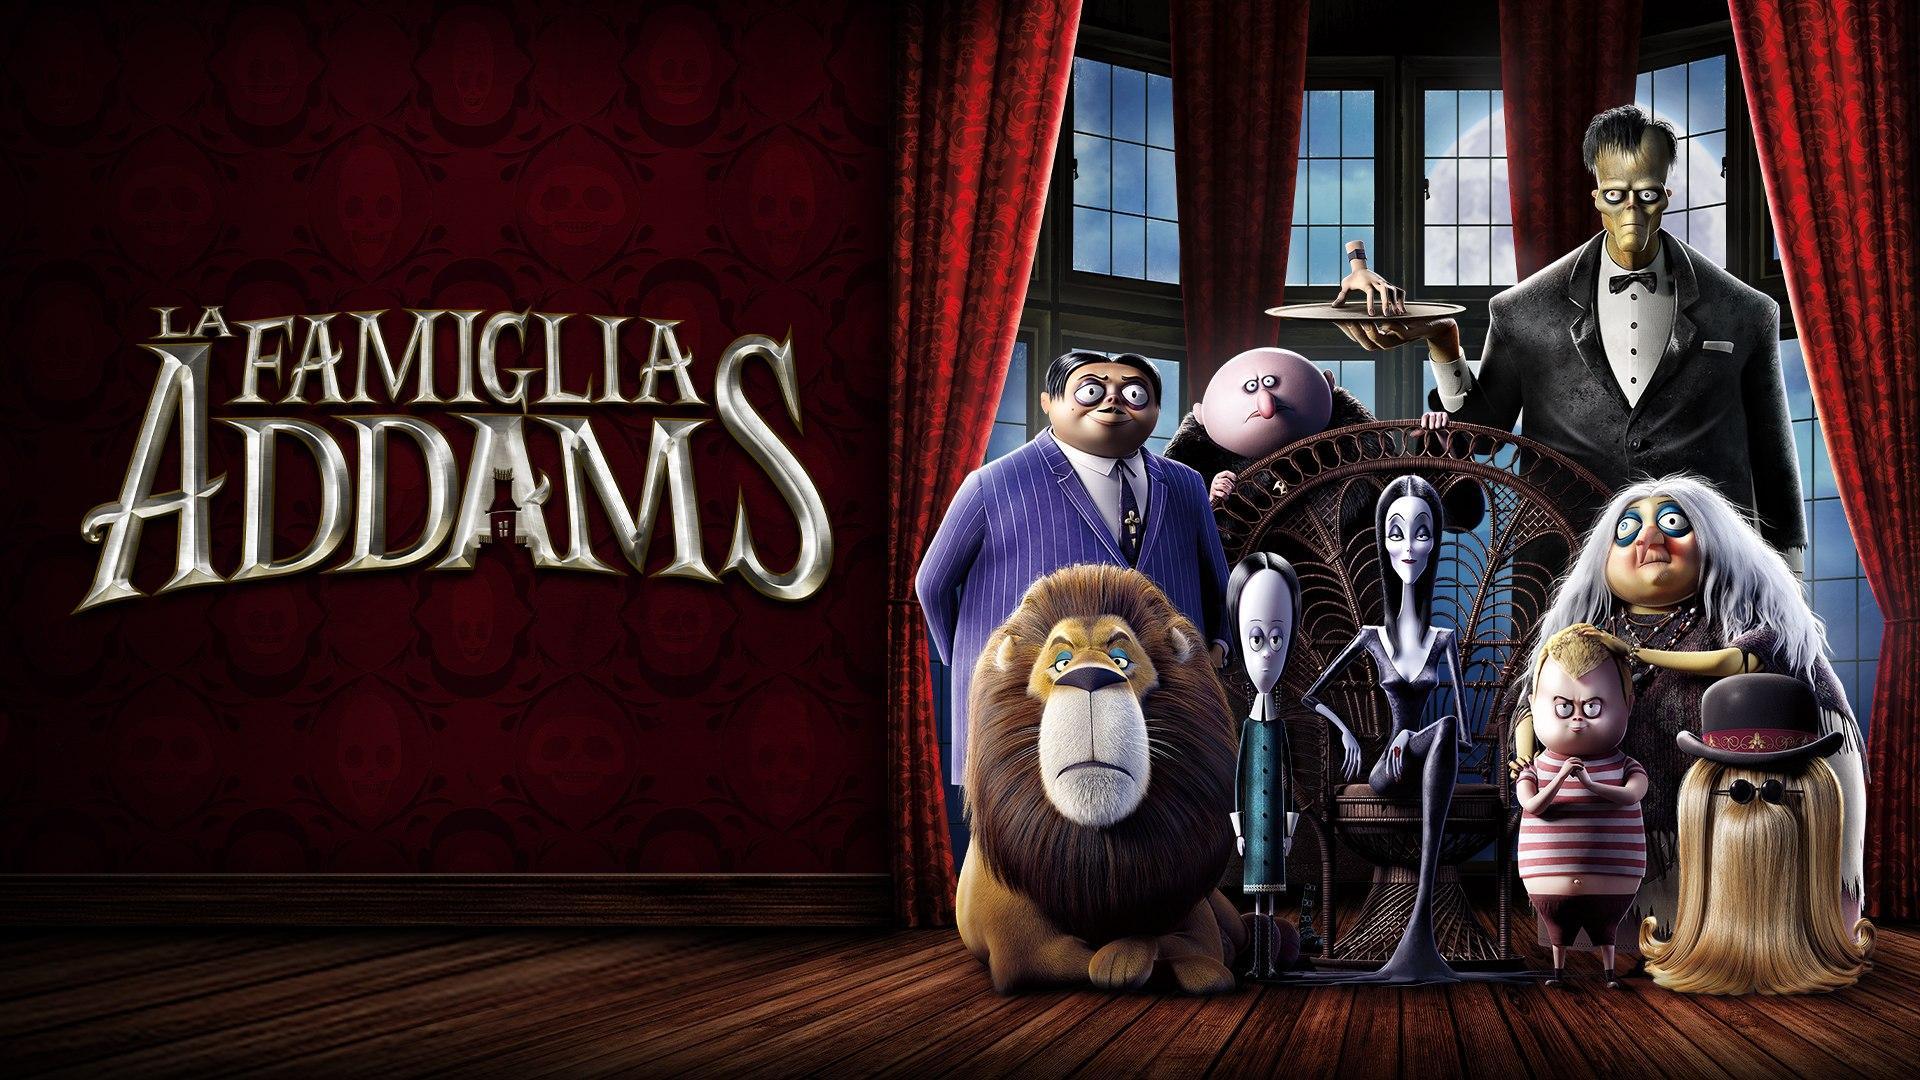 Sabato 24 Ottobre 2020 Sky Cinema HD, La Famiglia Addams